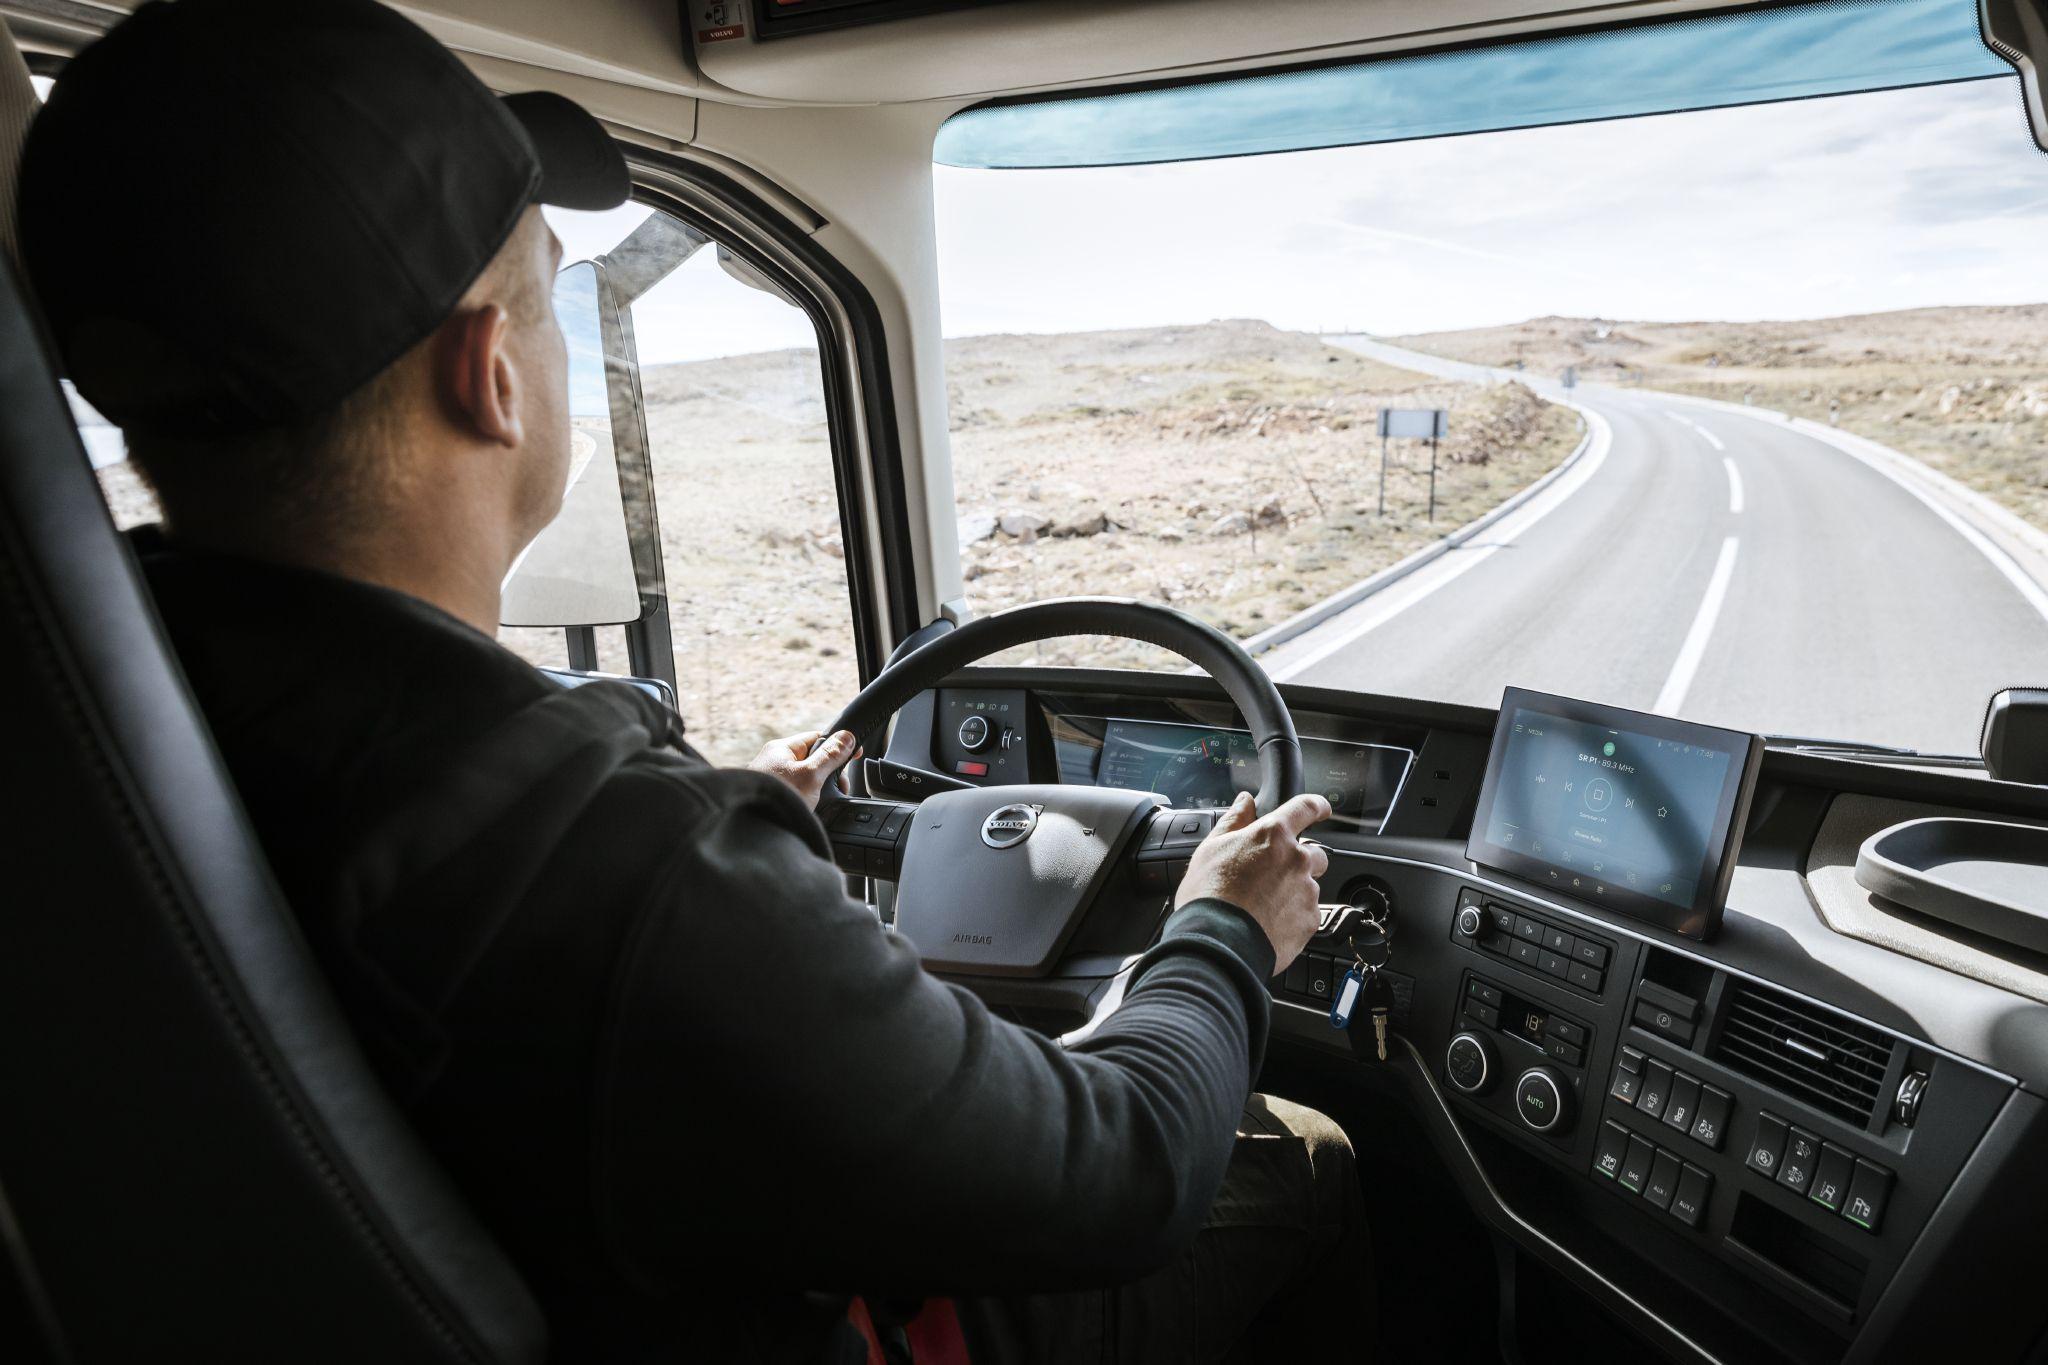 Volvo's new trucks that make it easier for drivers